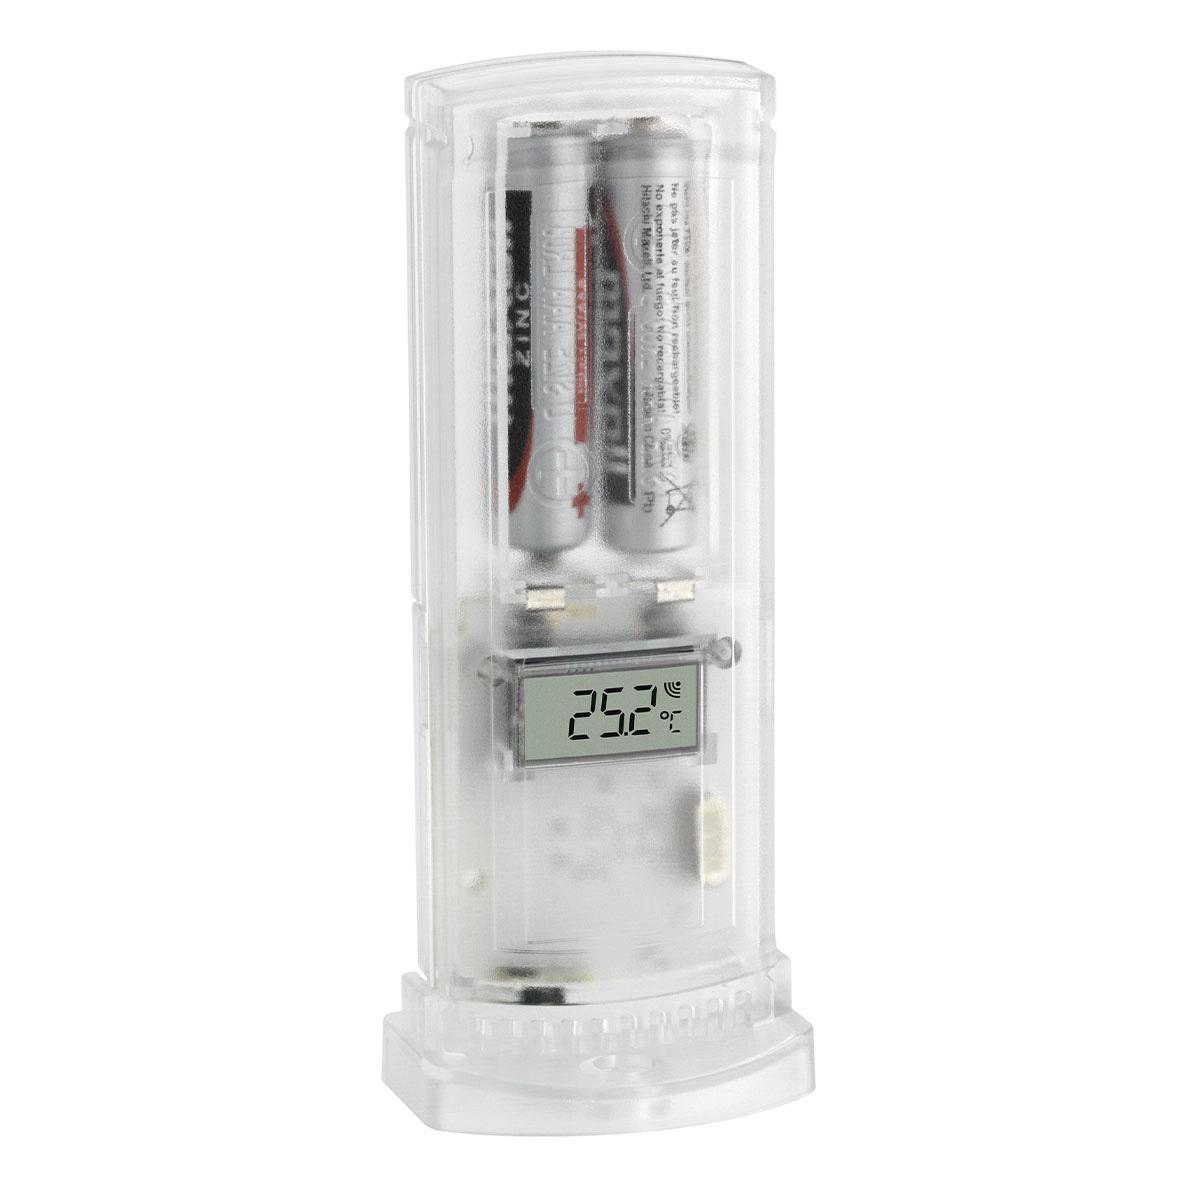 30-3045-it-funk-thermo-hygrometer-mit-lüftungsempfehlung-bel-air-sender-1200x1200px.jpg